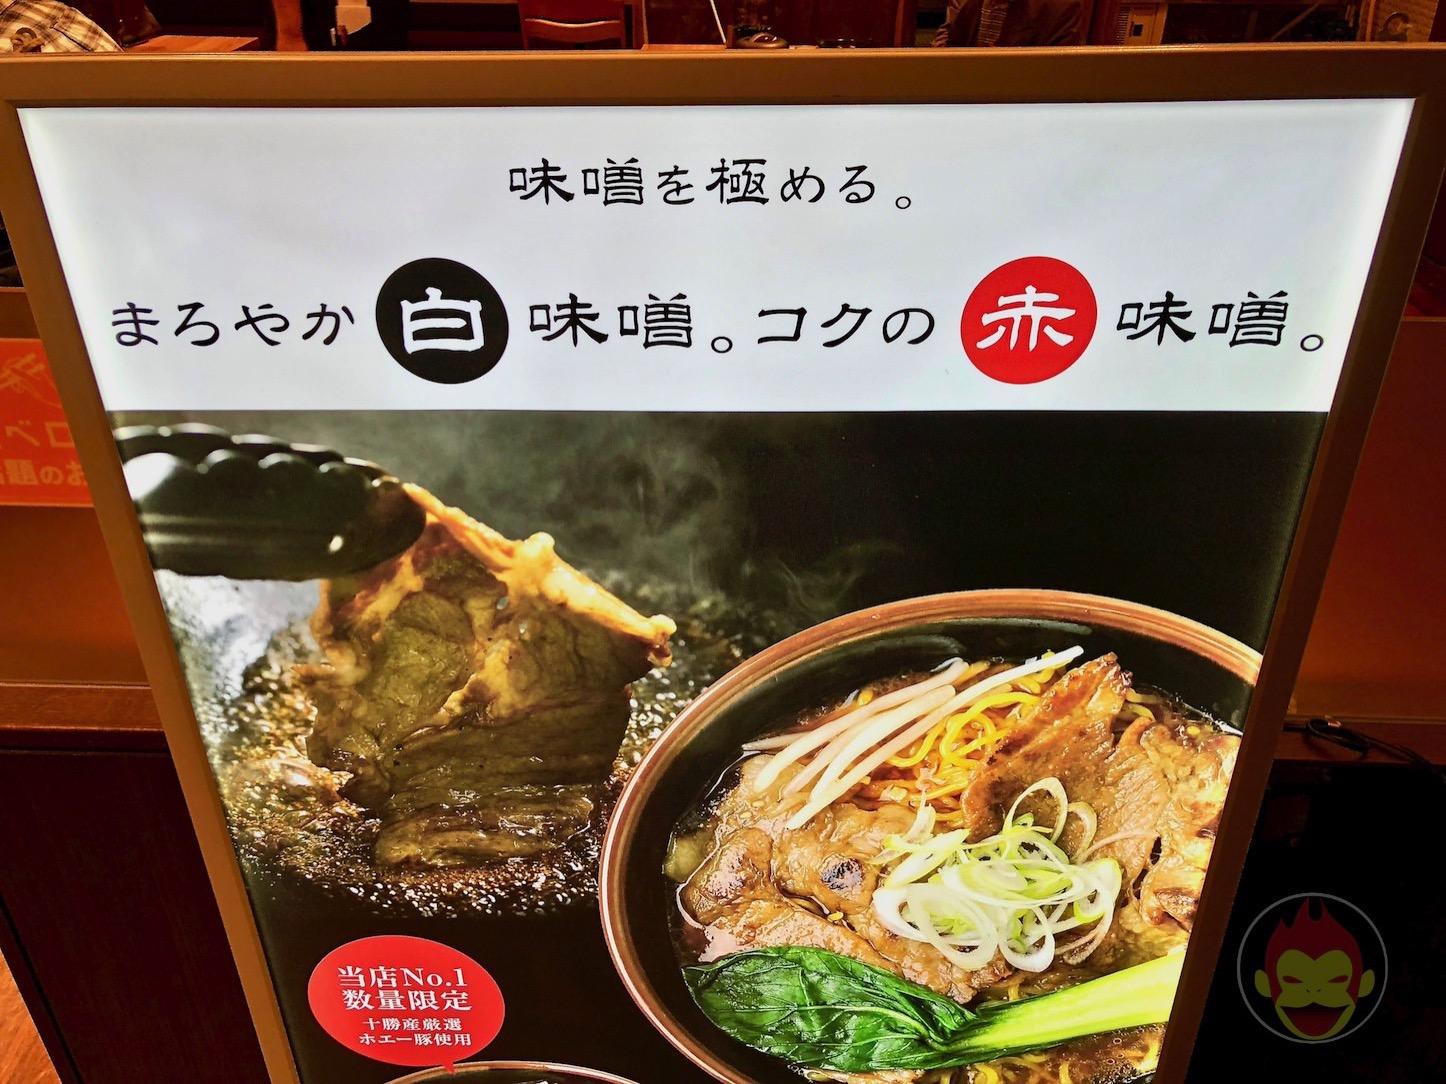 Hokkaido-Ramen-Dojo-Menya-Kaiko-10.jpg